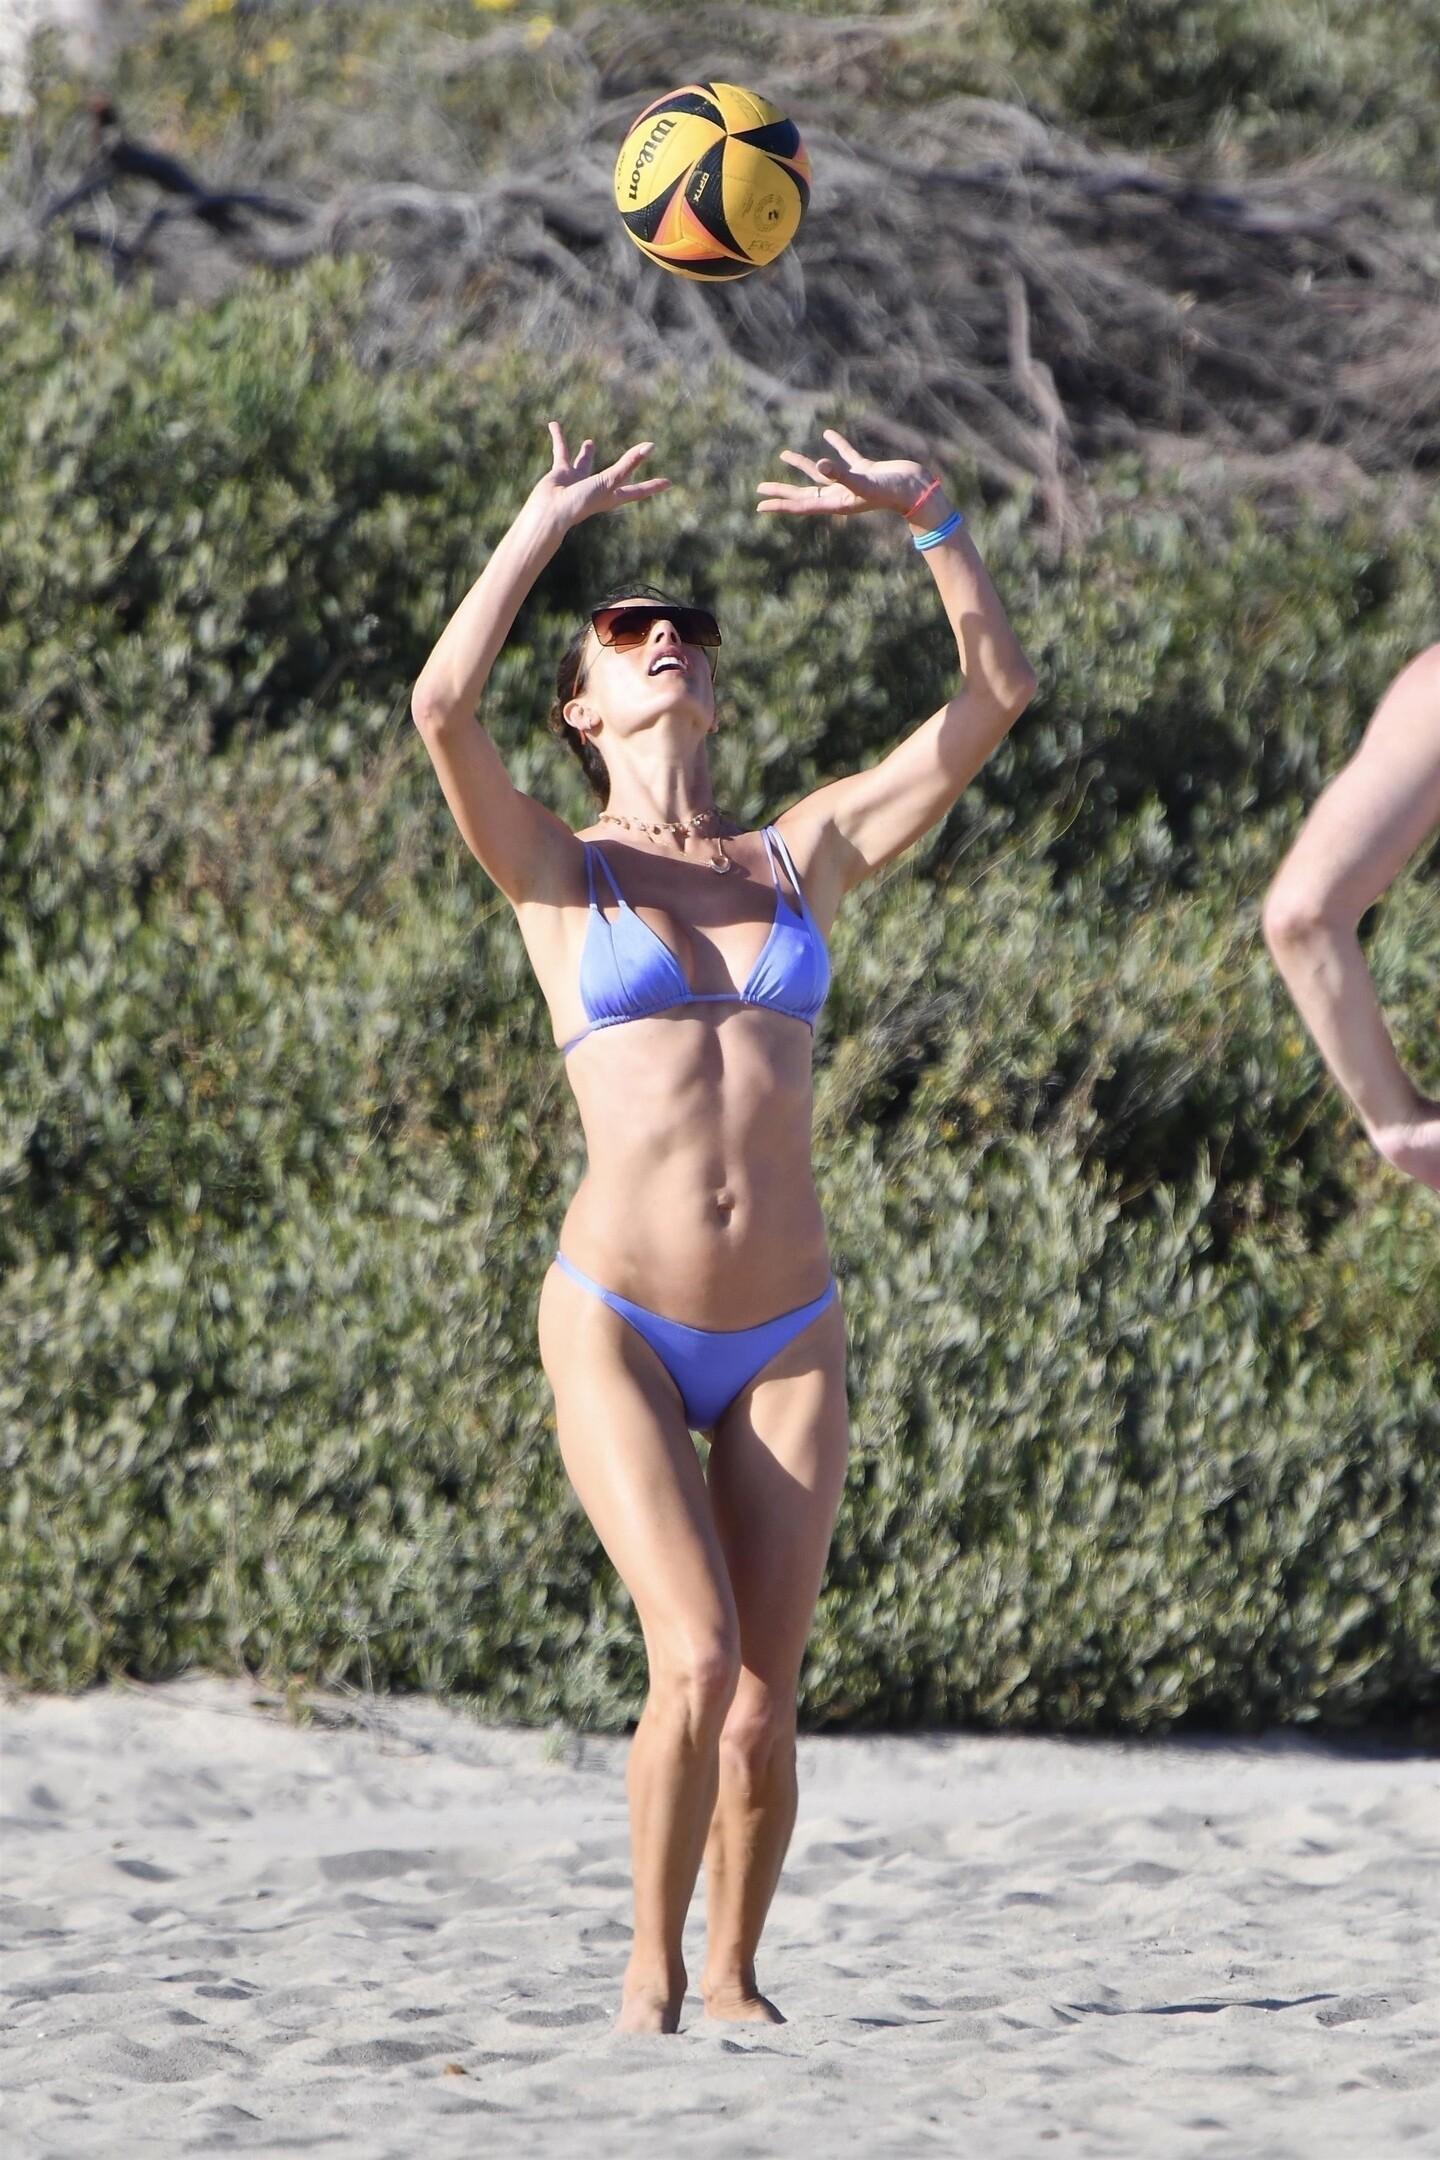 Alessandra Ambrosio Bikini fappenings.com 4